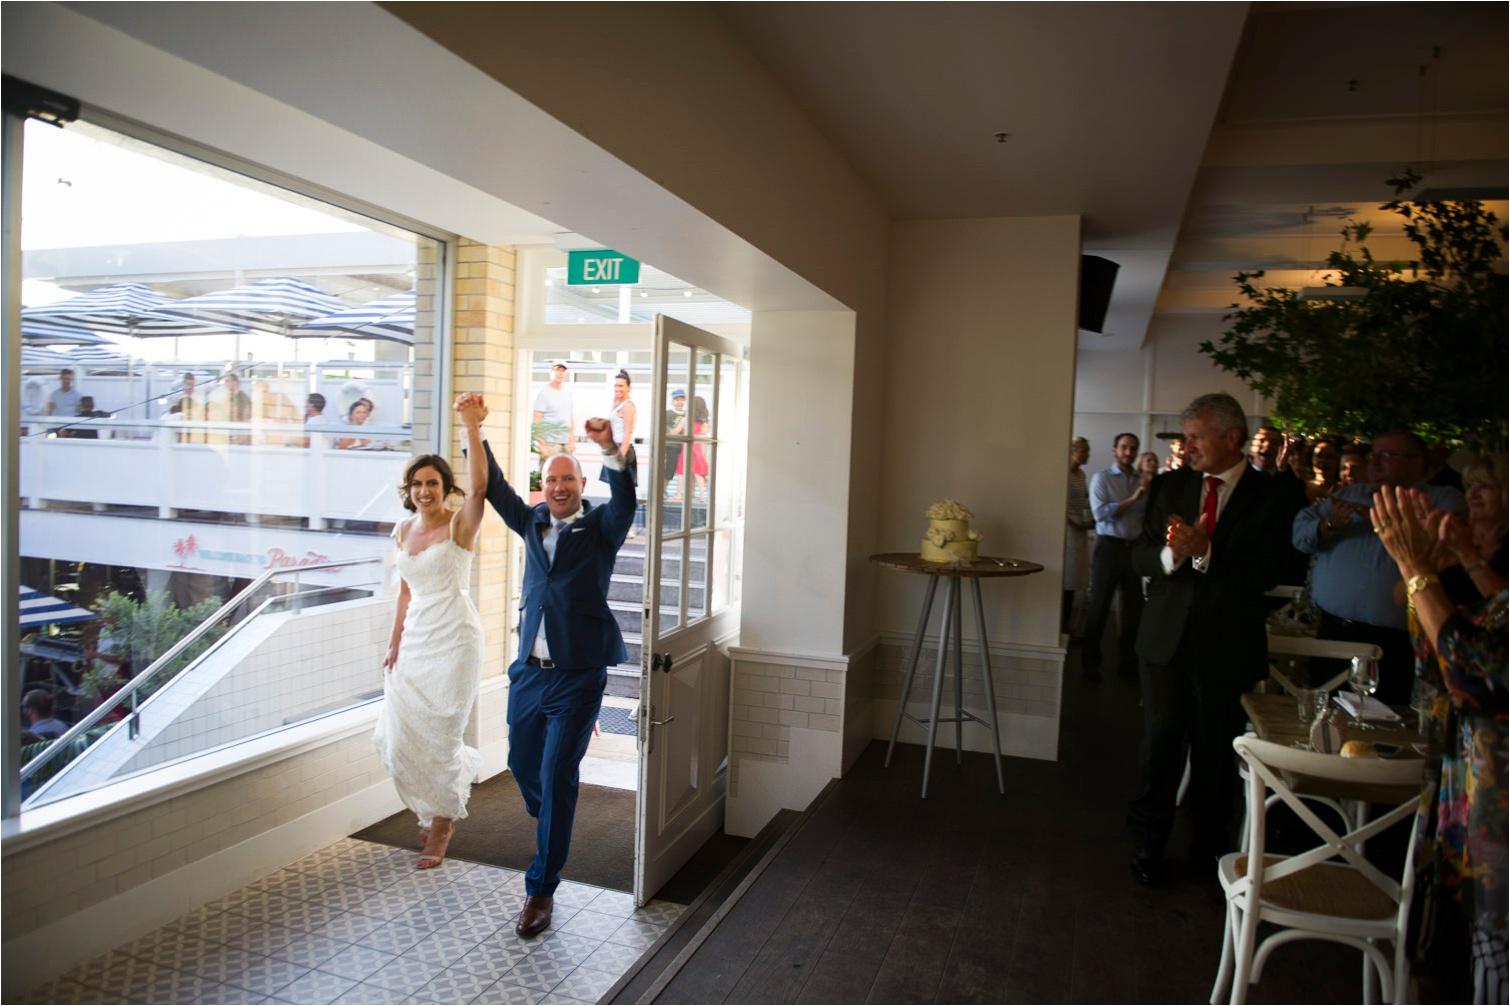 Nicole&Carlie_Watsons_Bay_Hotel_Wedding_by_Gold_Coast_Photographers-The_Follans53.jpg